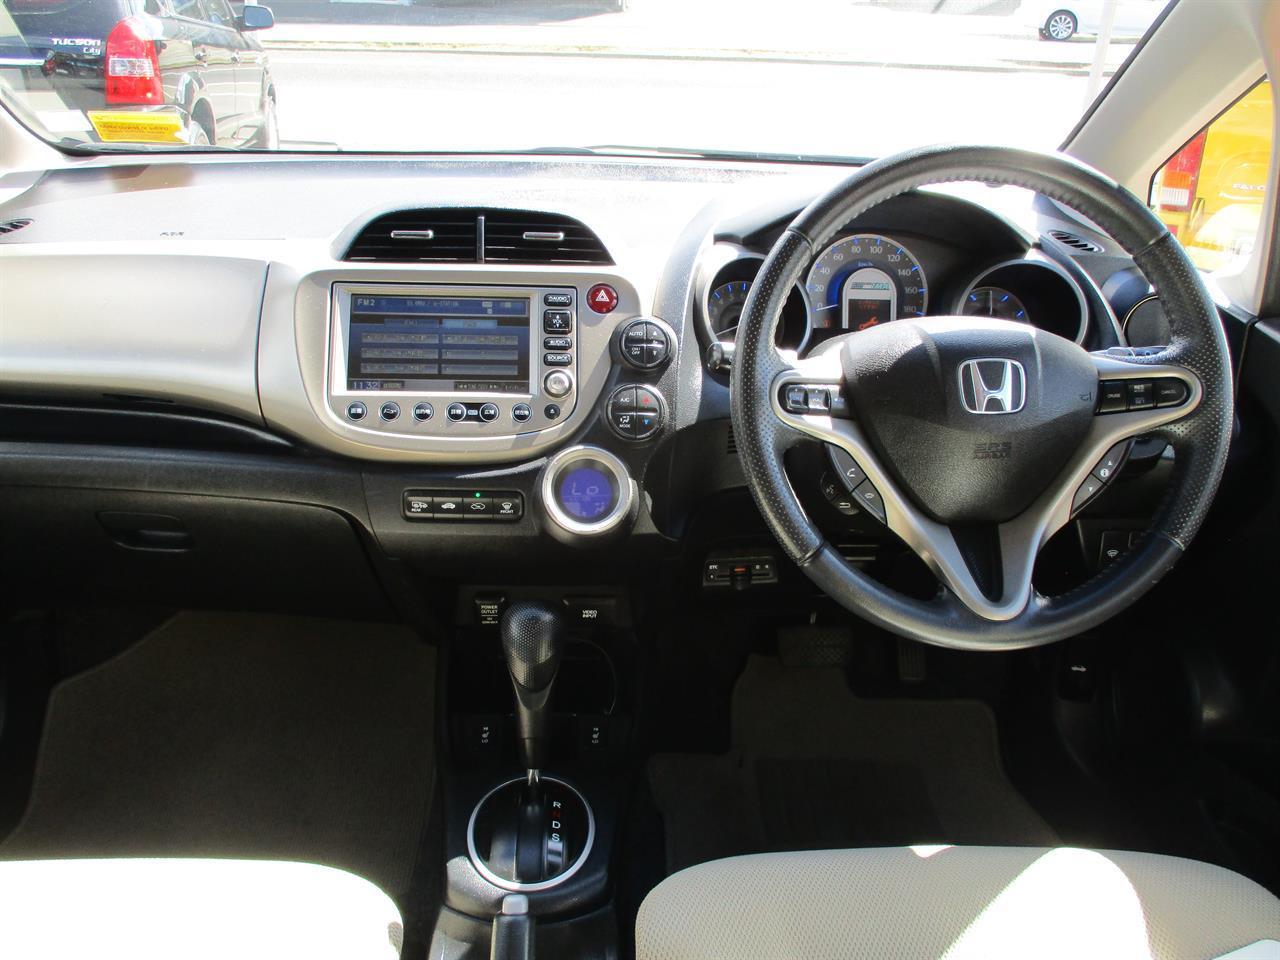 image-14, 2011 Honda Fit Hybrid at Dunedin